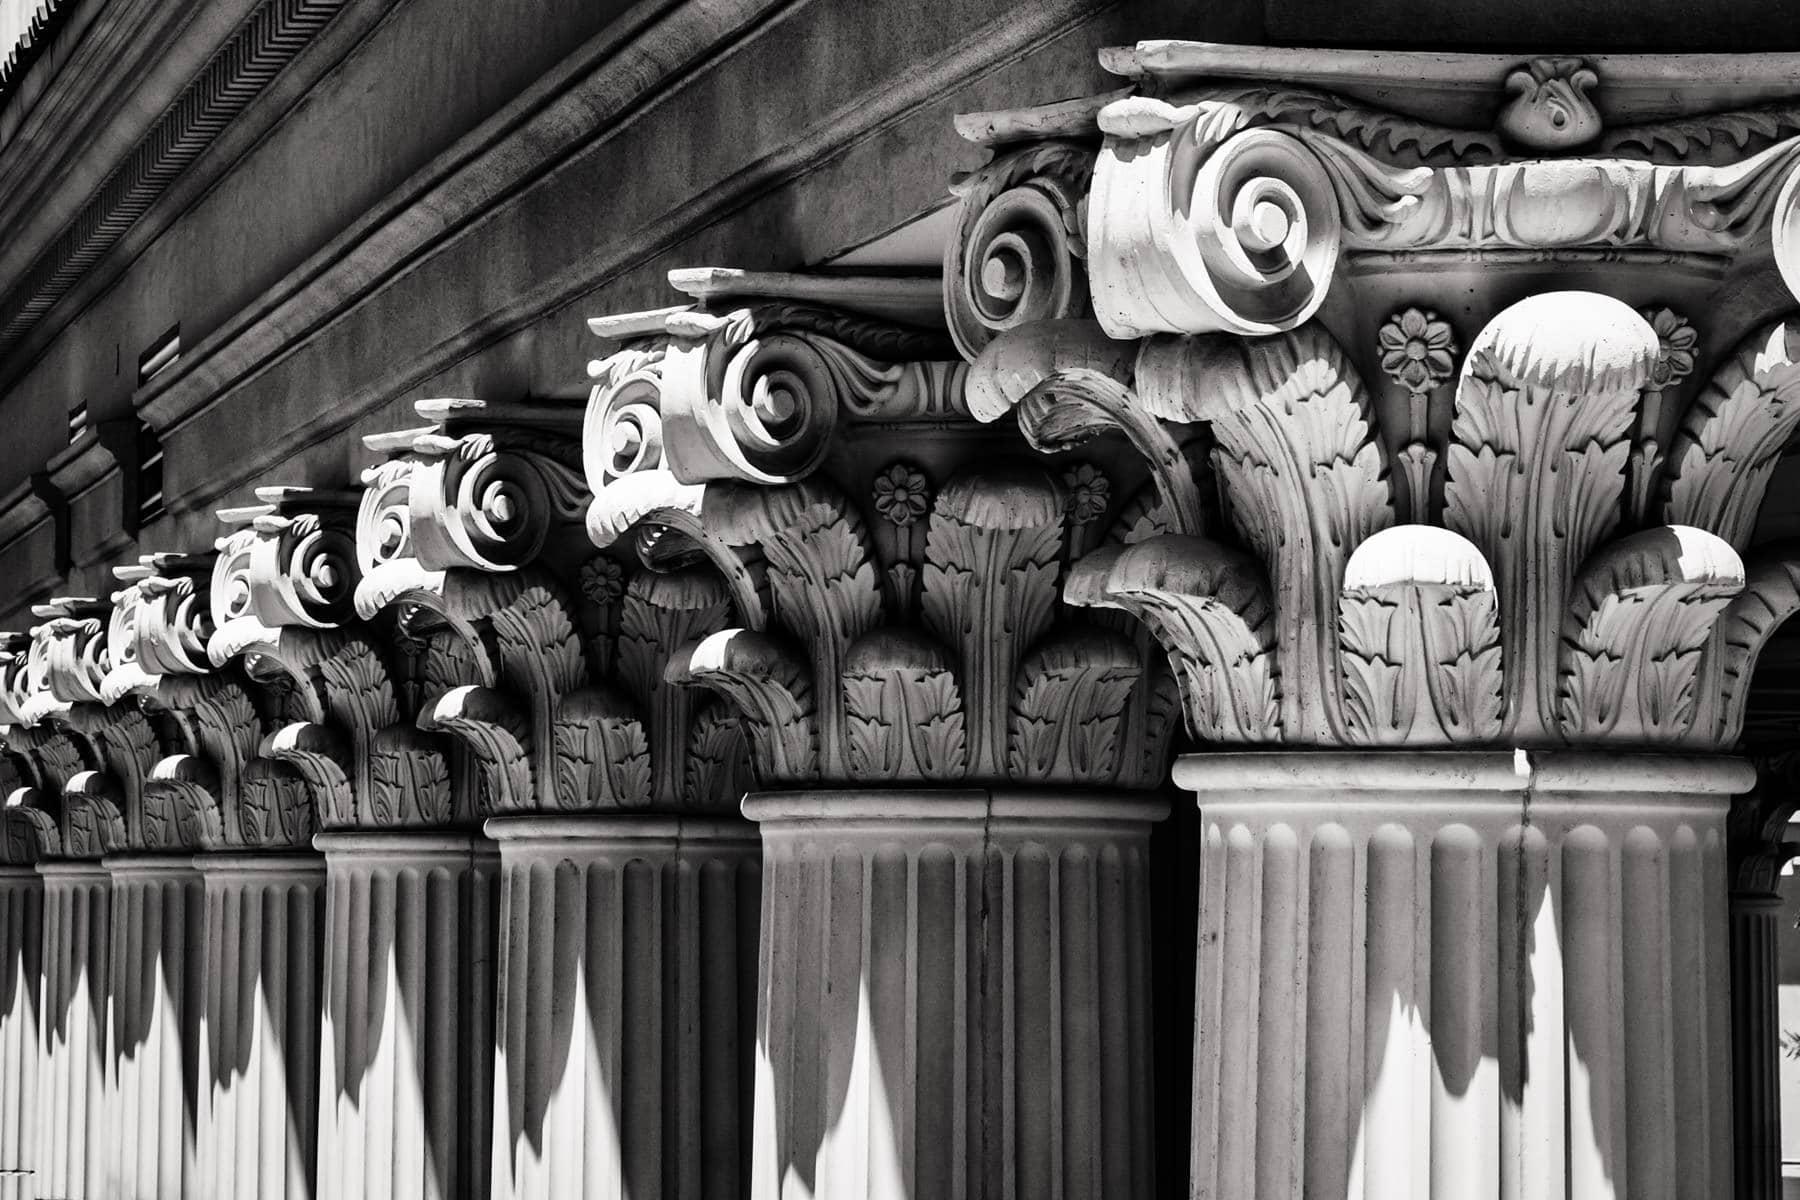 Architectural detail of ornate Corinthian columns at Caesars Palace, Las Vegas.